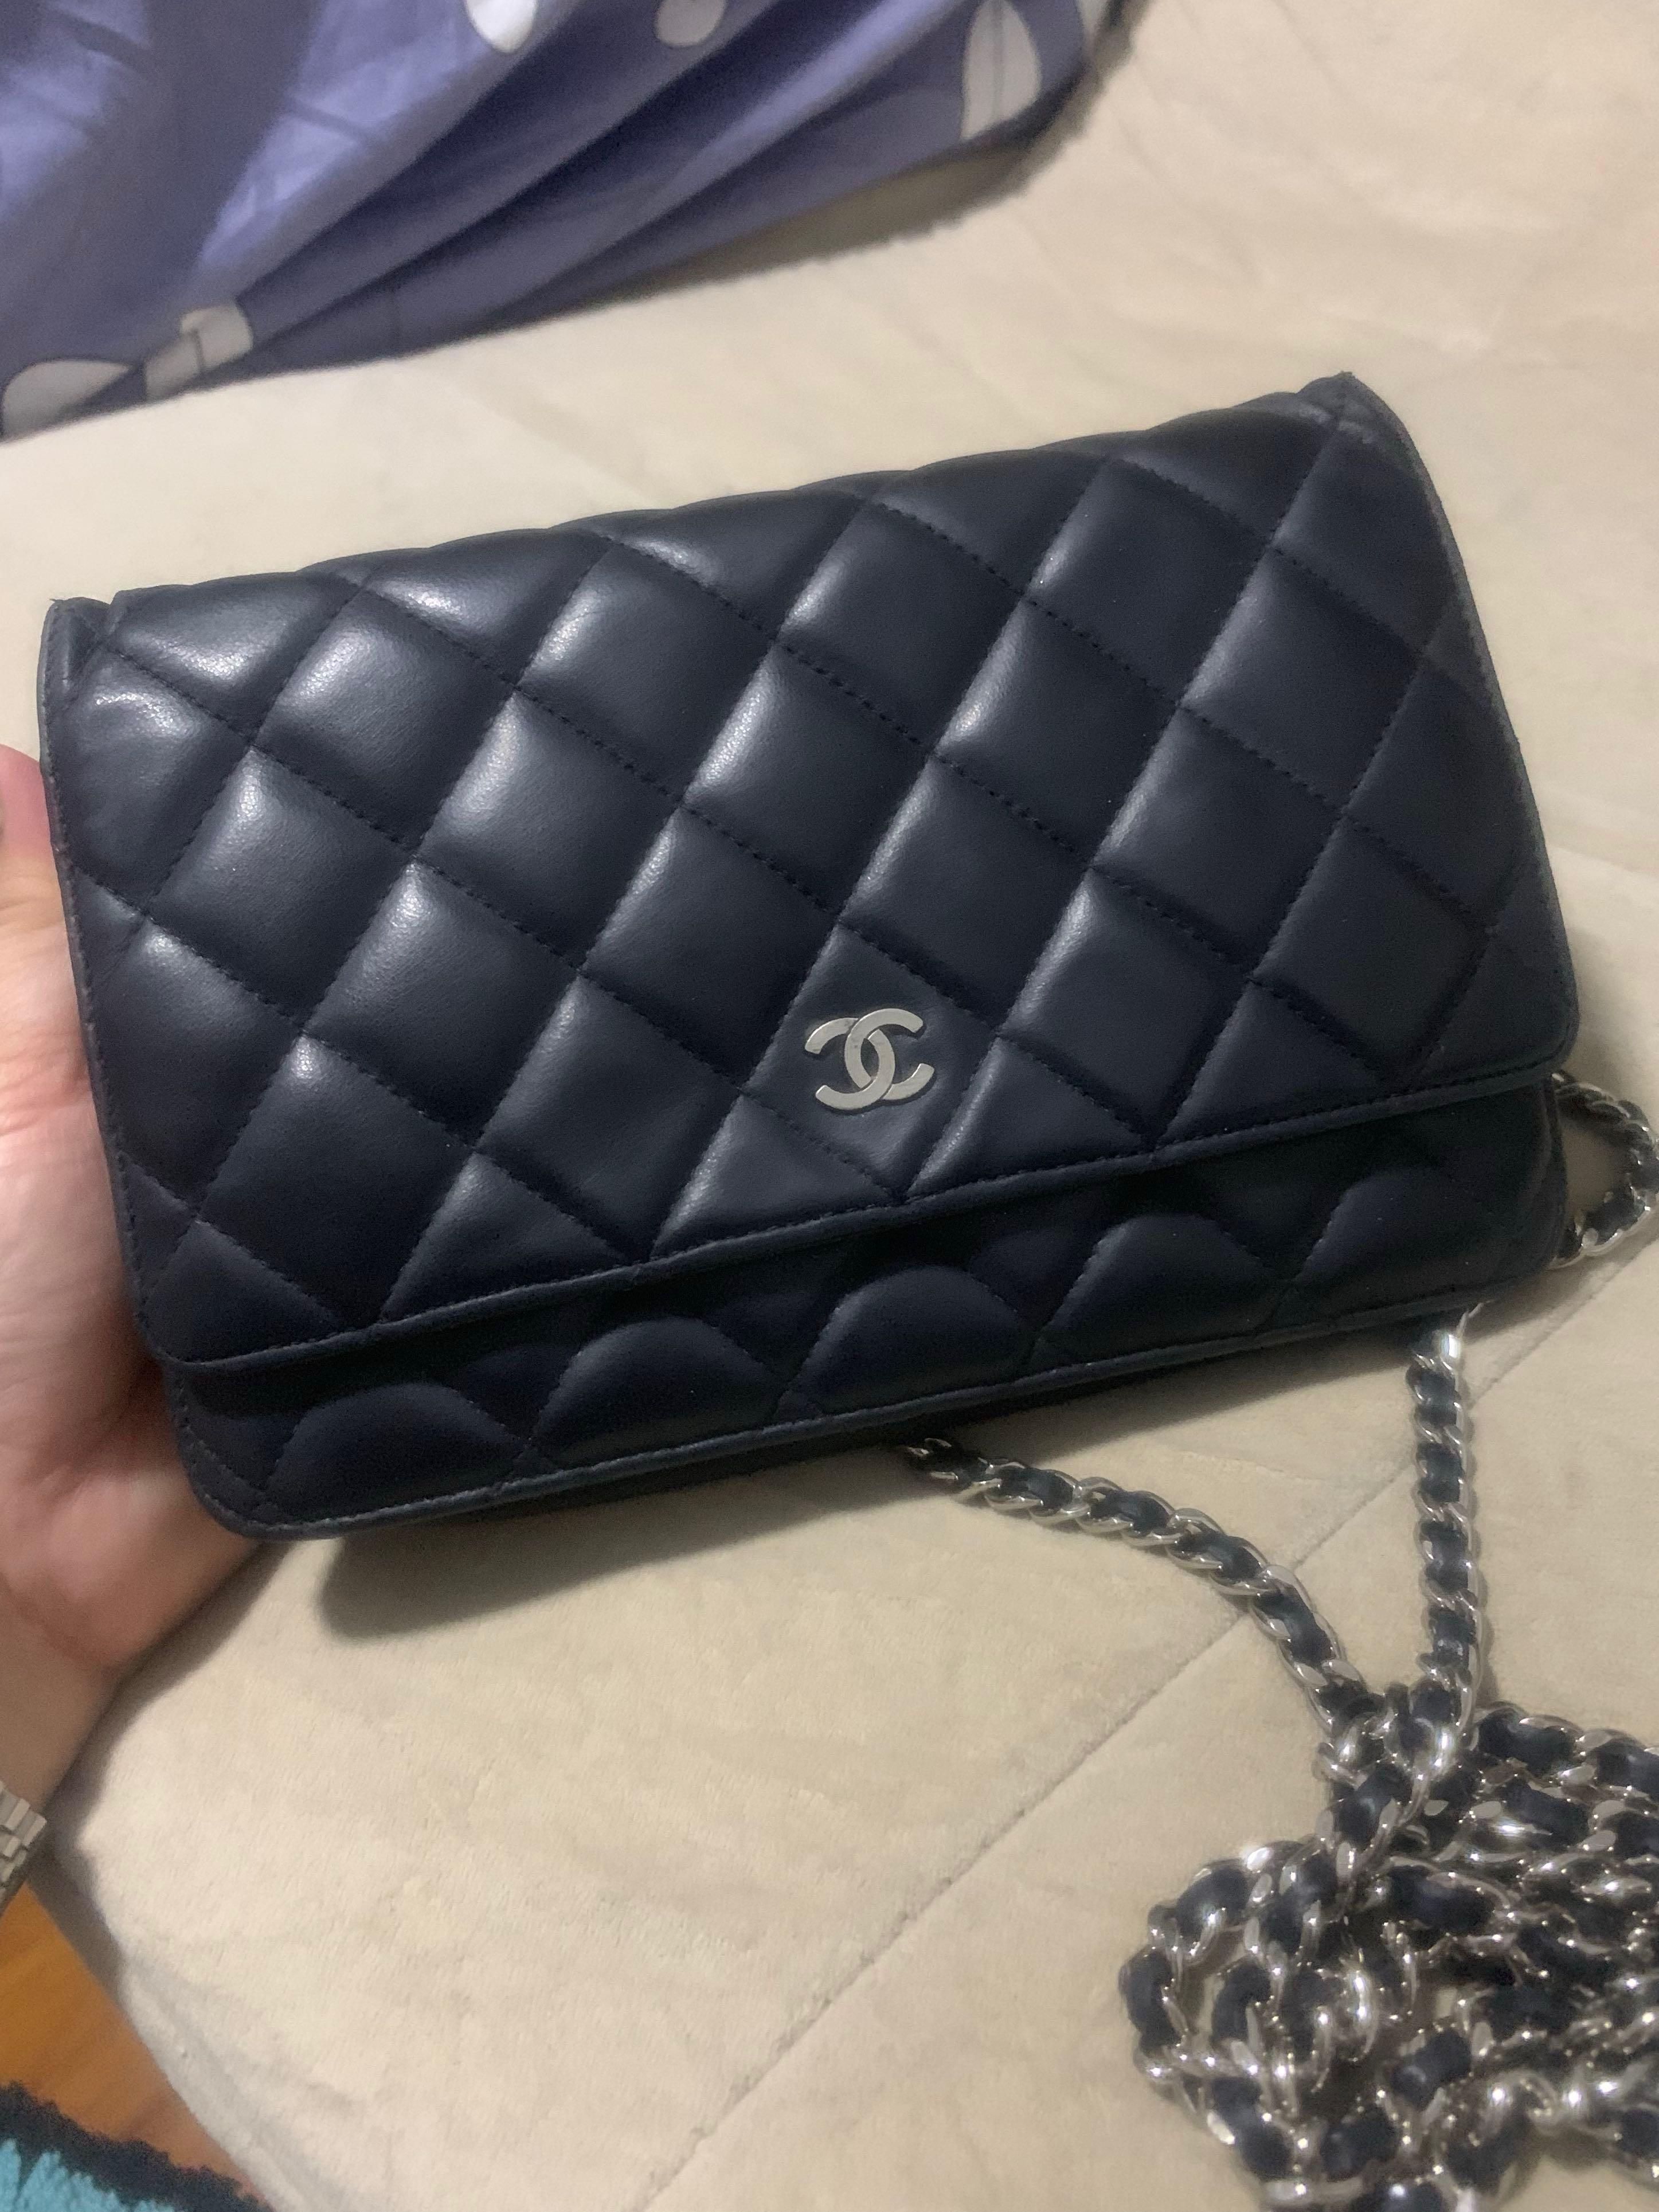 74d5537888e3 🎀Auth Chanel Sling bag / Wallet on Chain WOC SHW w receipt ...